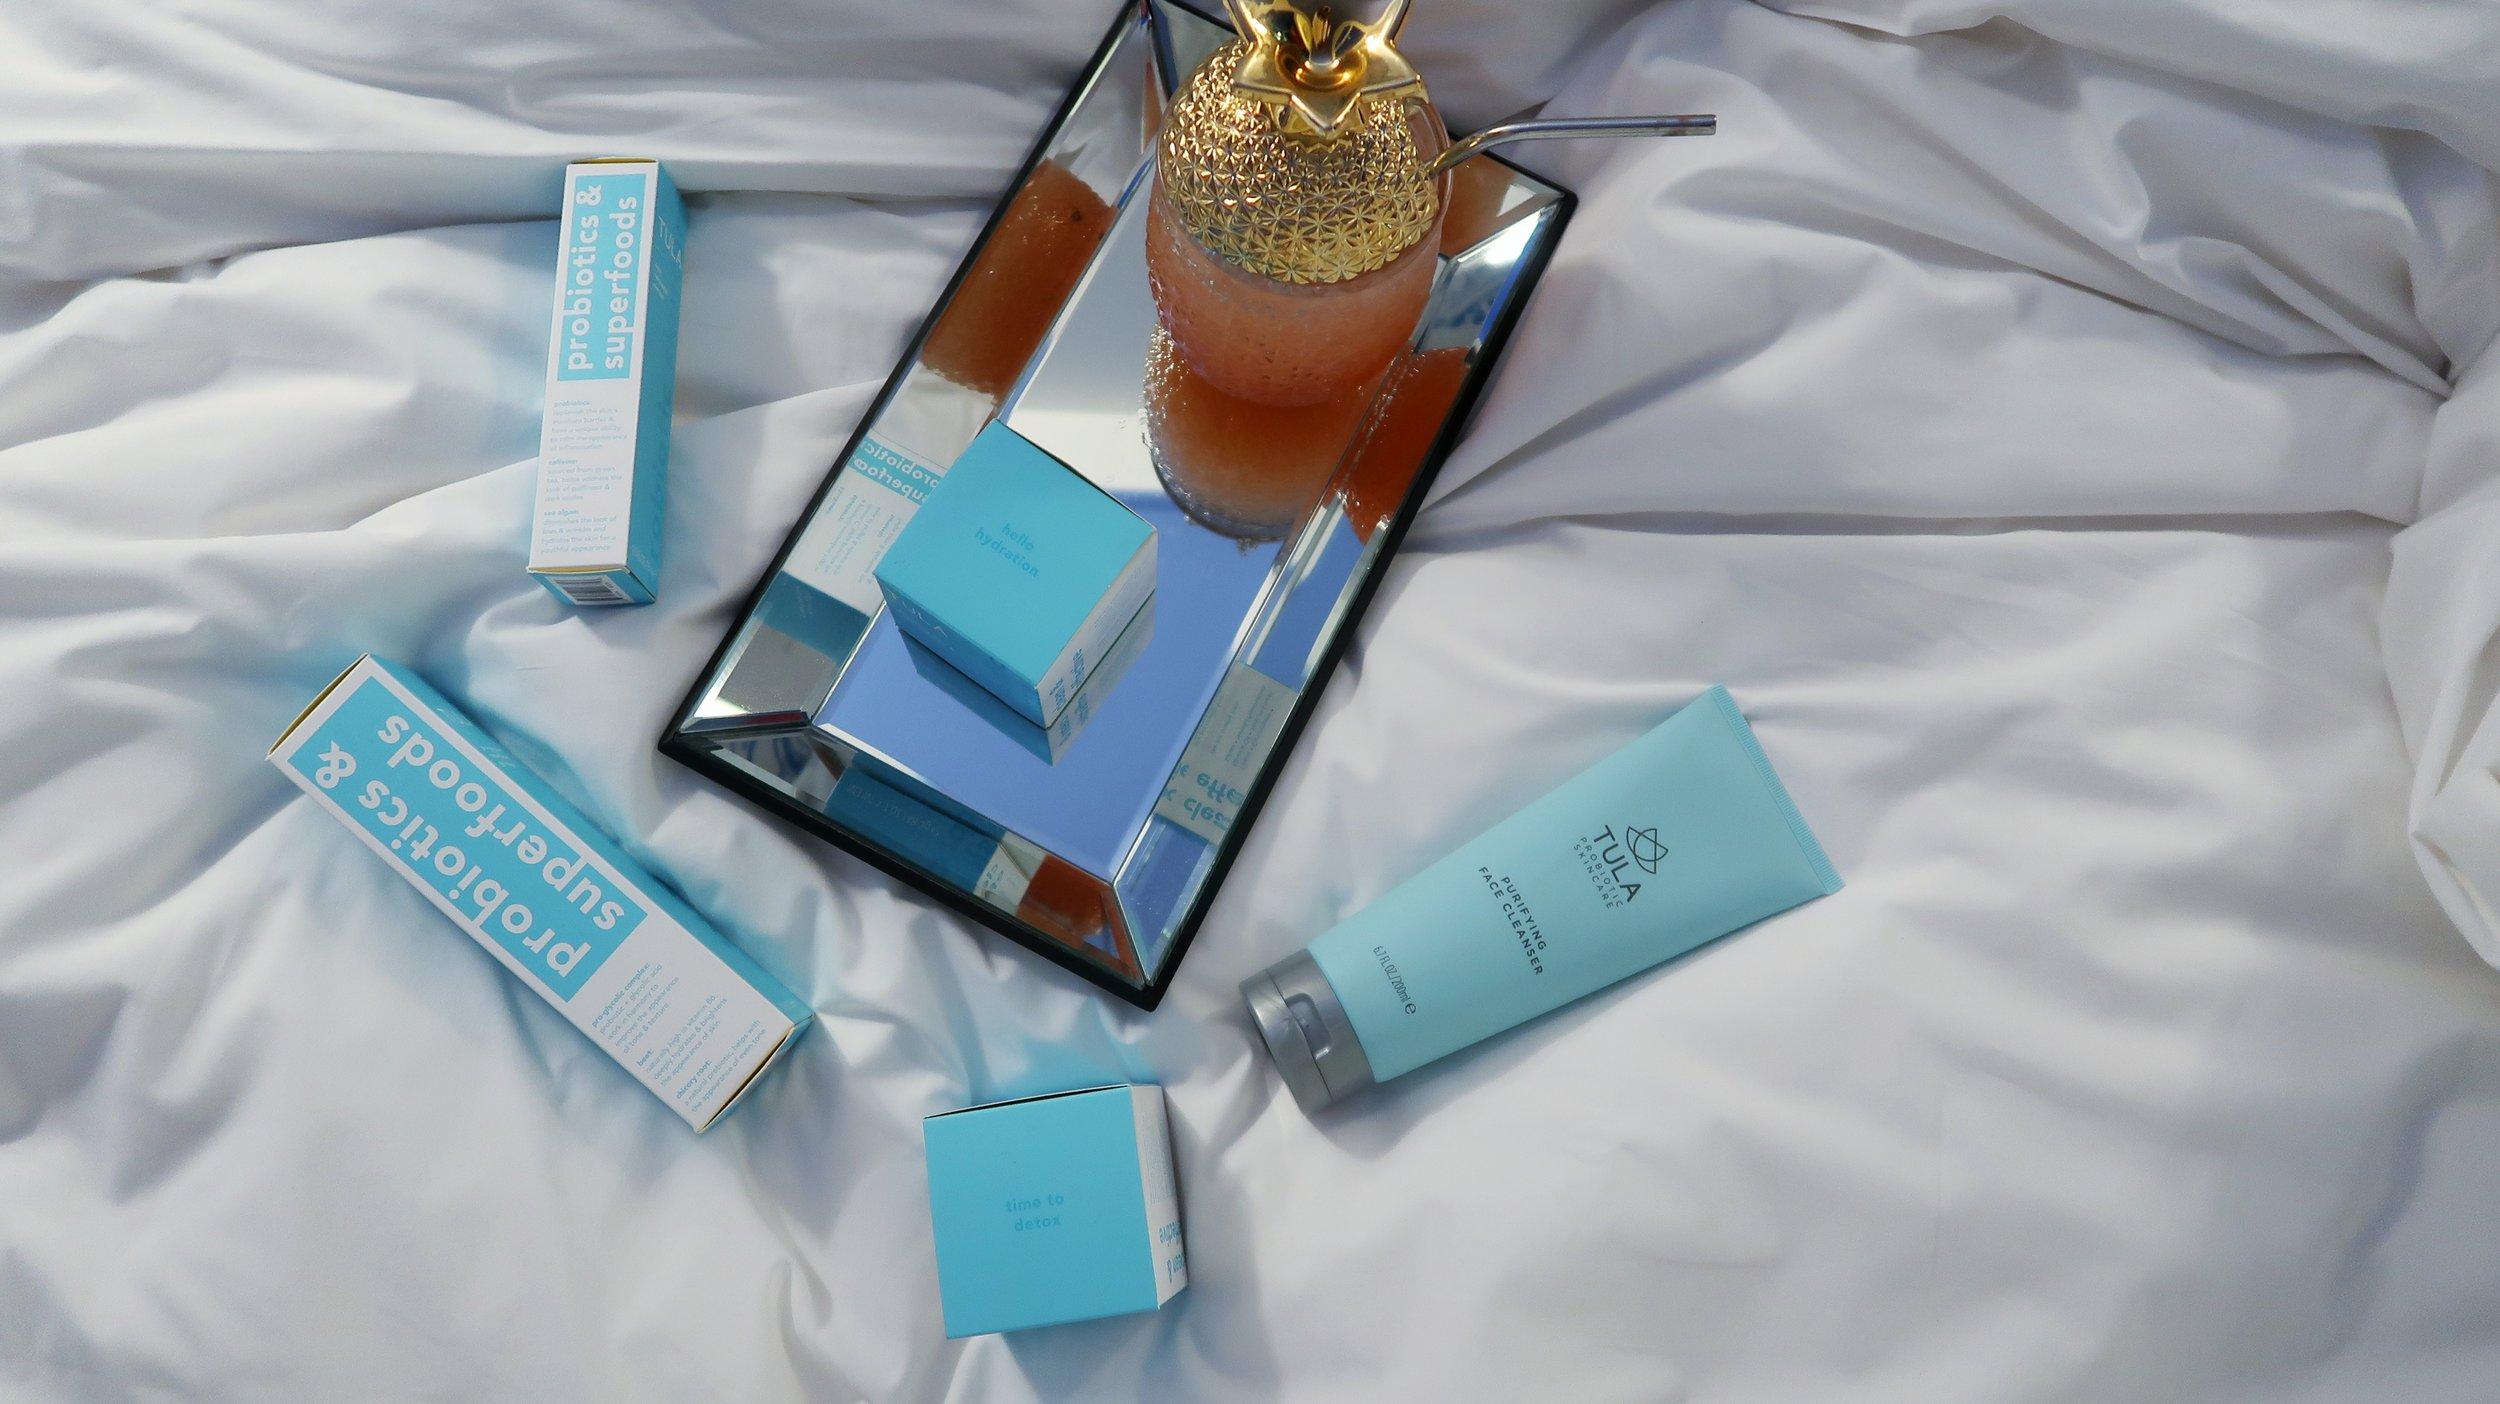 Tula Natural Skin Care Products.jpeg